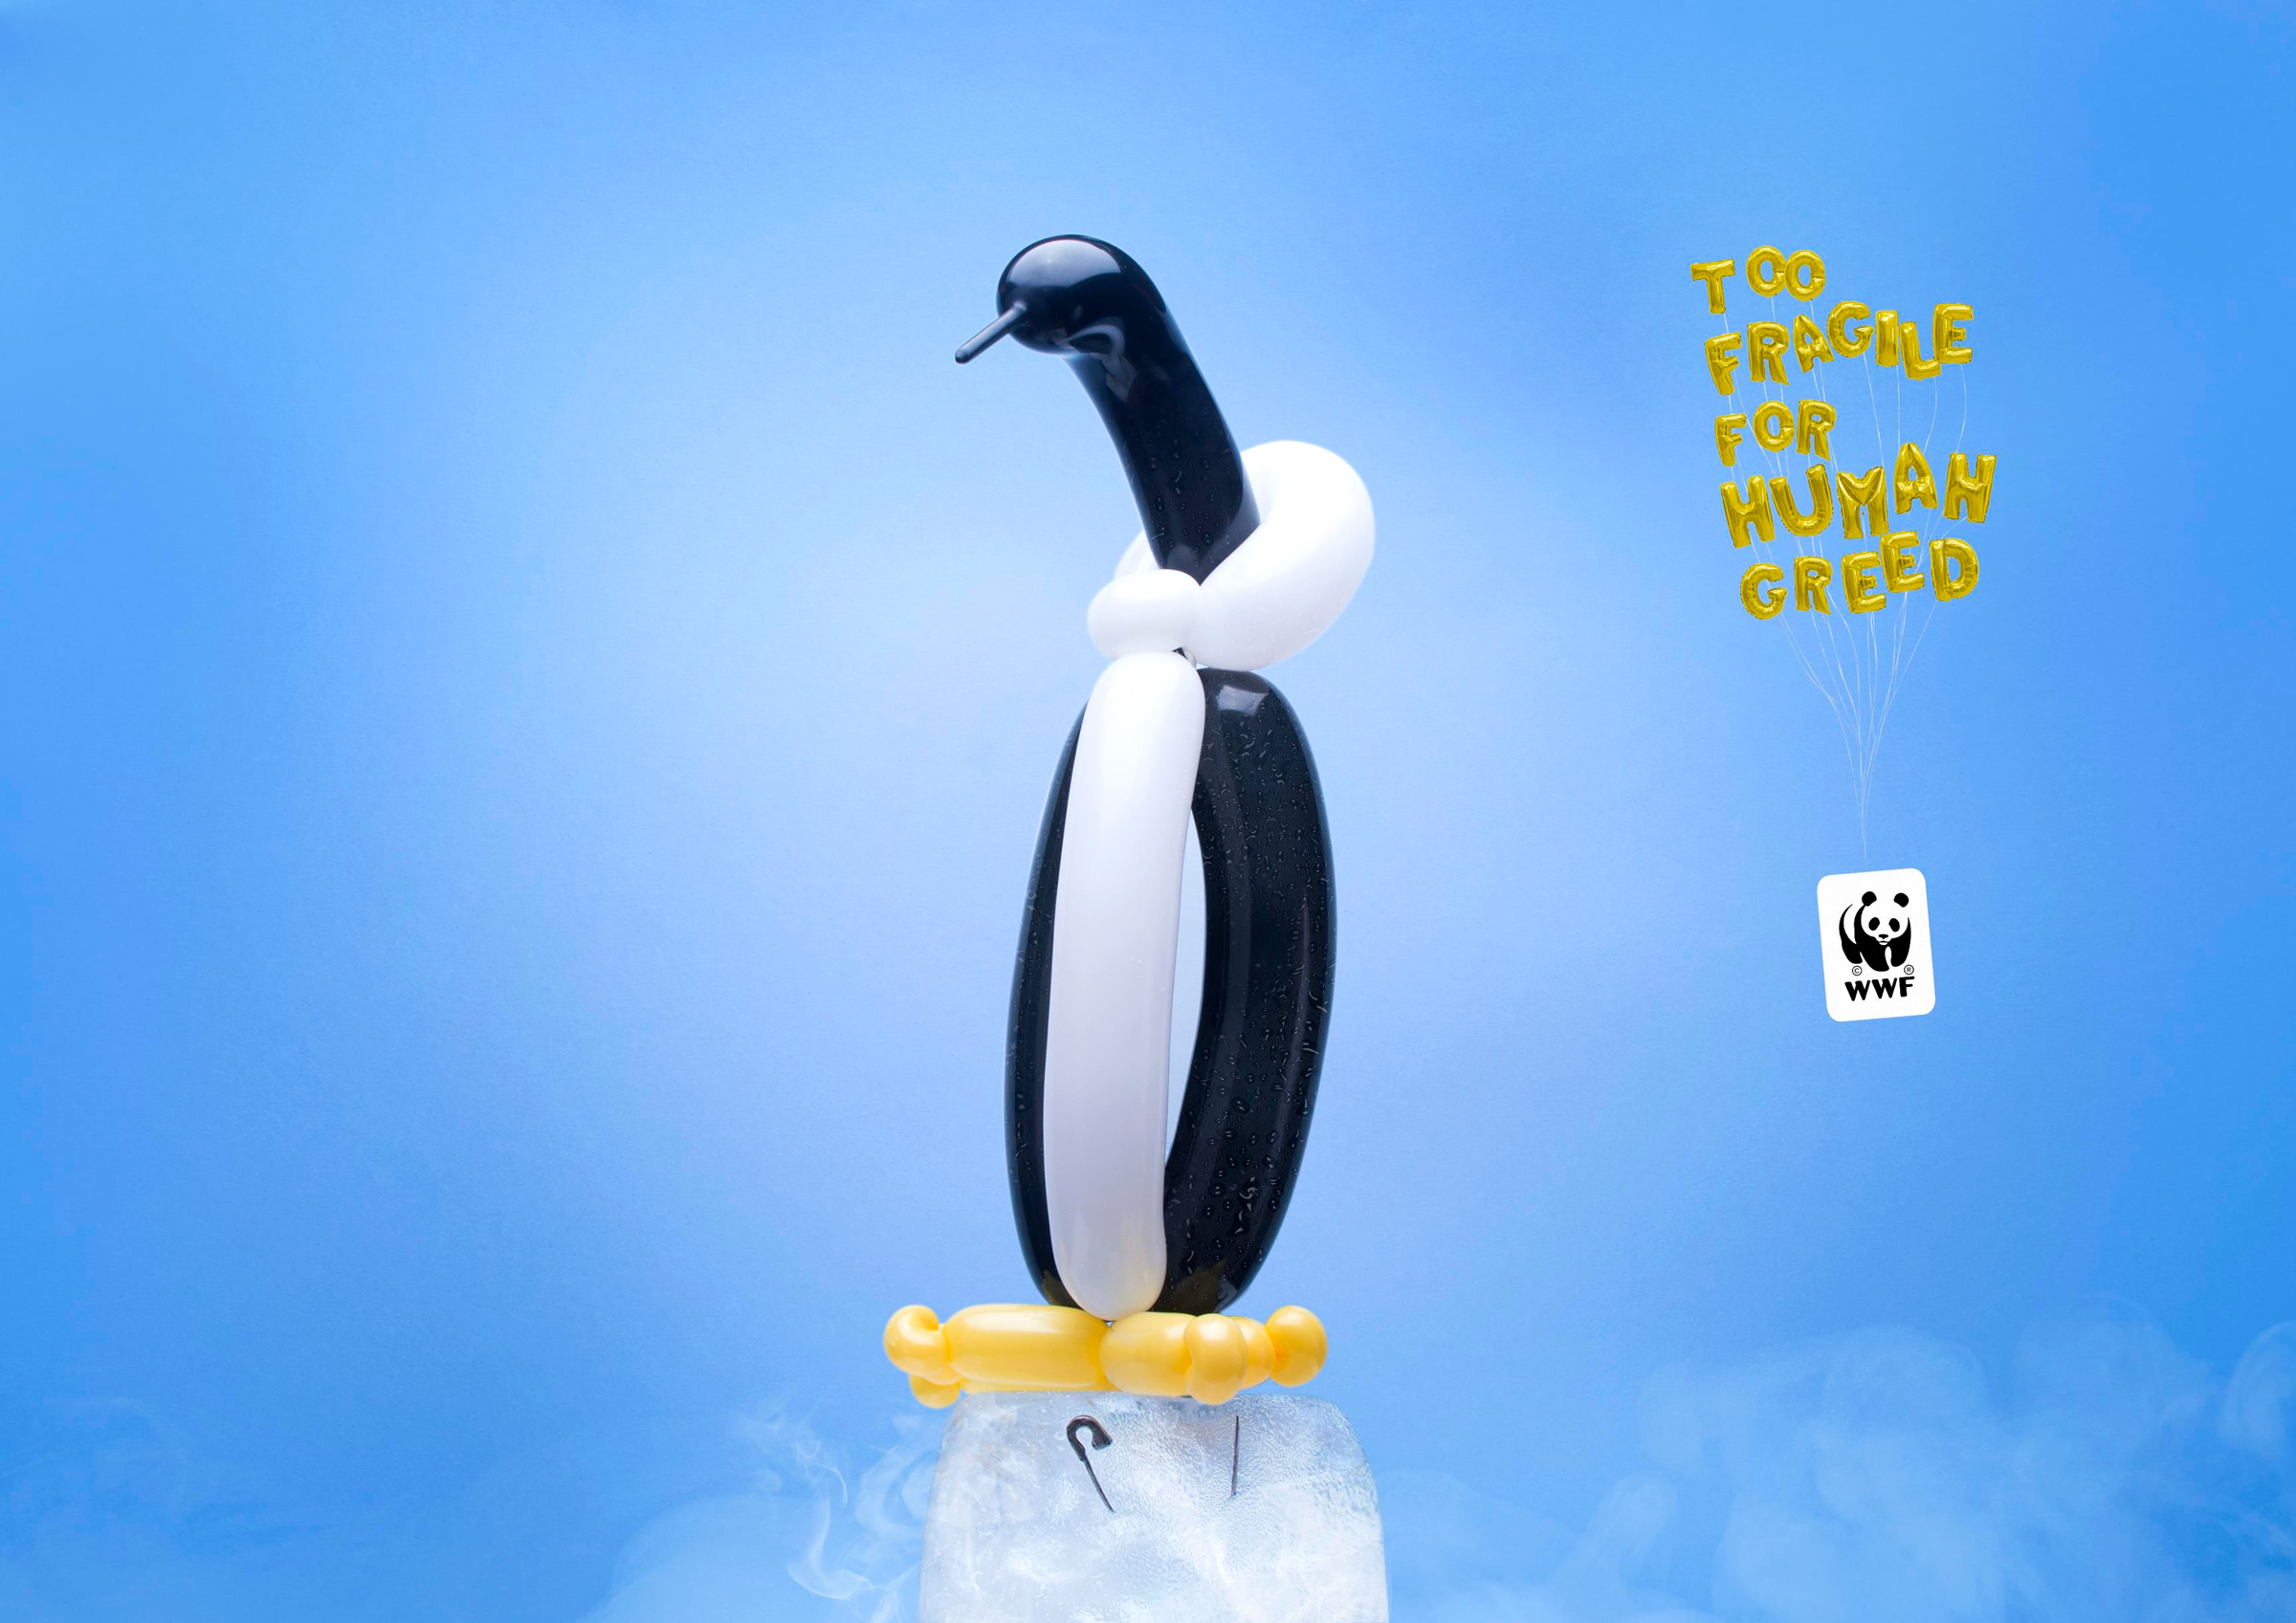 WWF Print Advert By Miami Ad School: Ballon animals, 4 ...